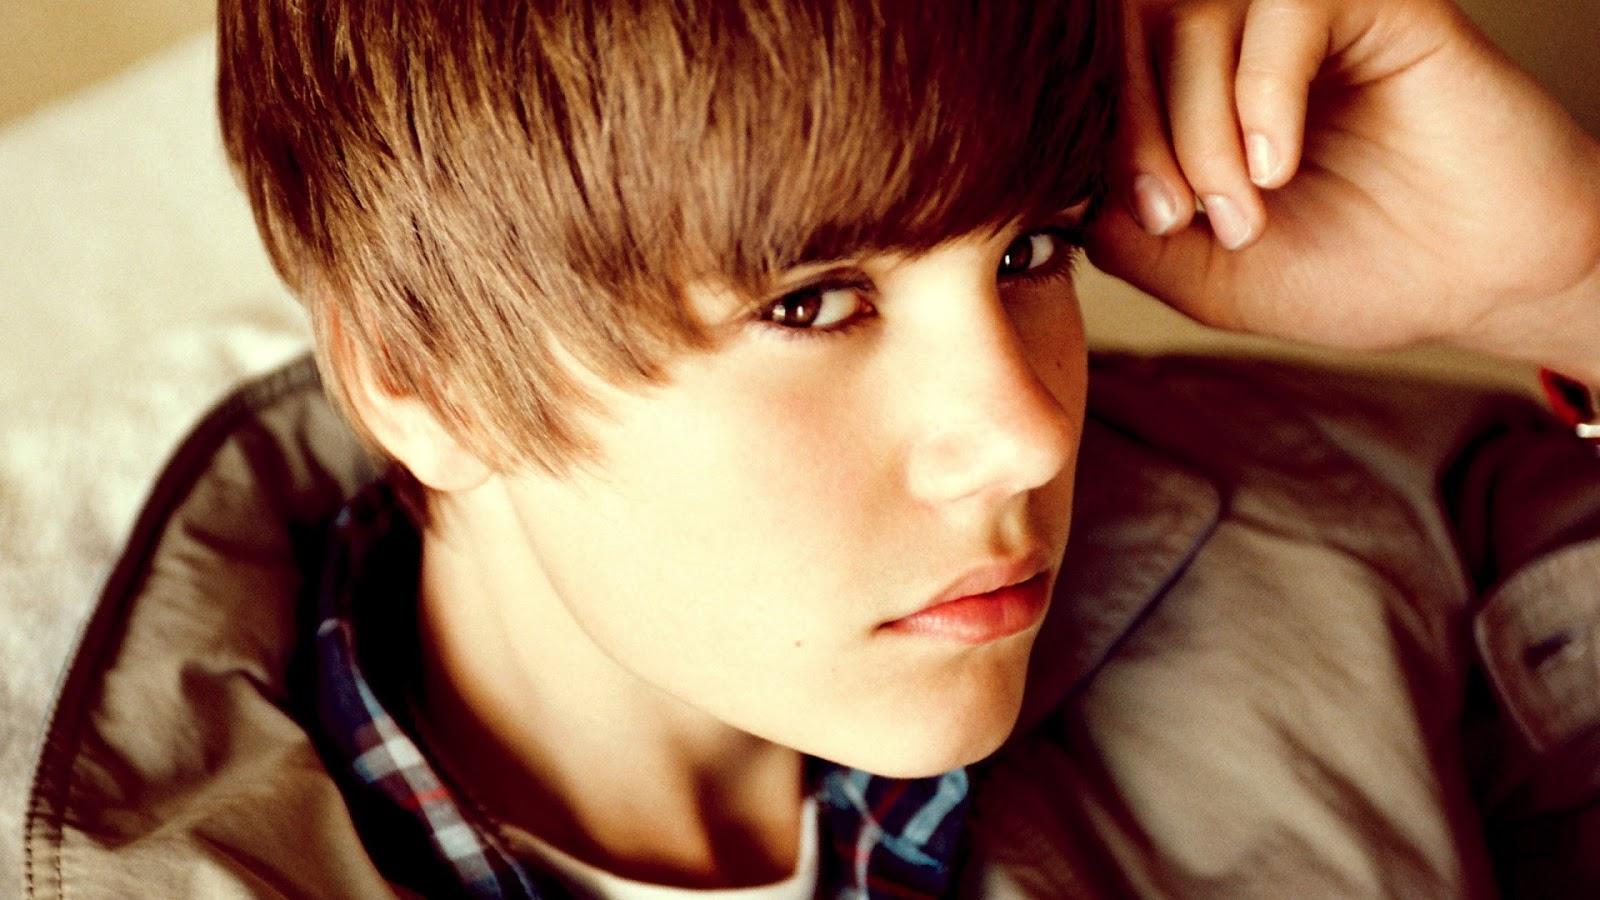 http://3.bp.blogspot.com/-1hwHK1PvBc0/UTBOAZPkhKI/AAAAAAAAAHY/c922RBRhhEs/s1600/Cool-Justin-Bieber-Wallpaper.jpg